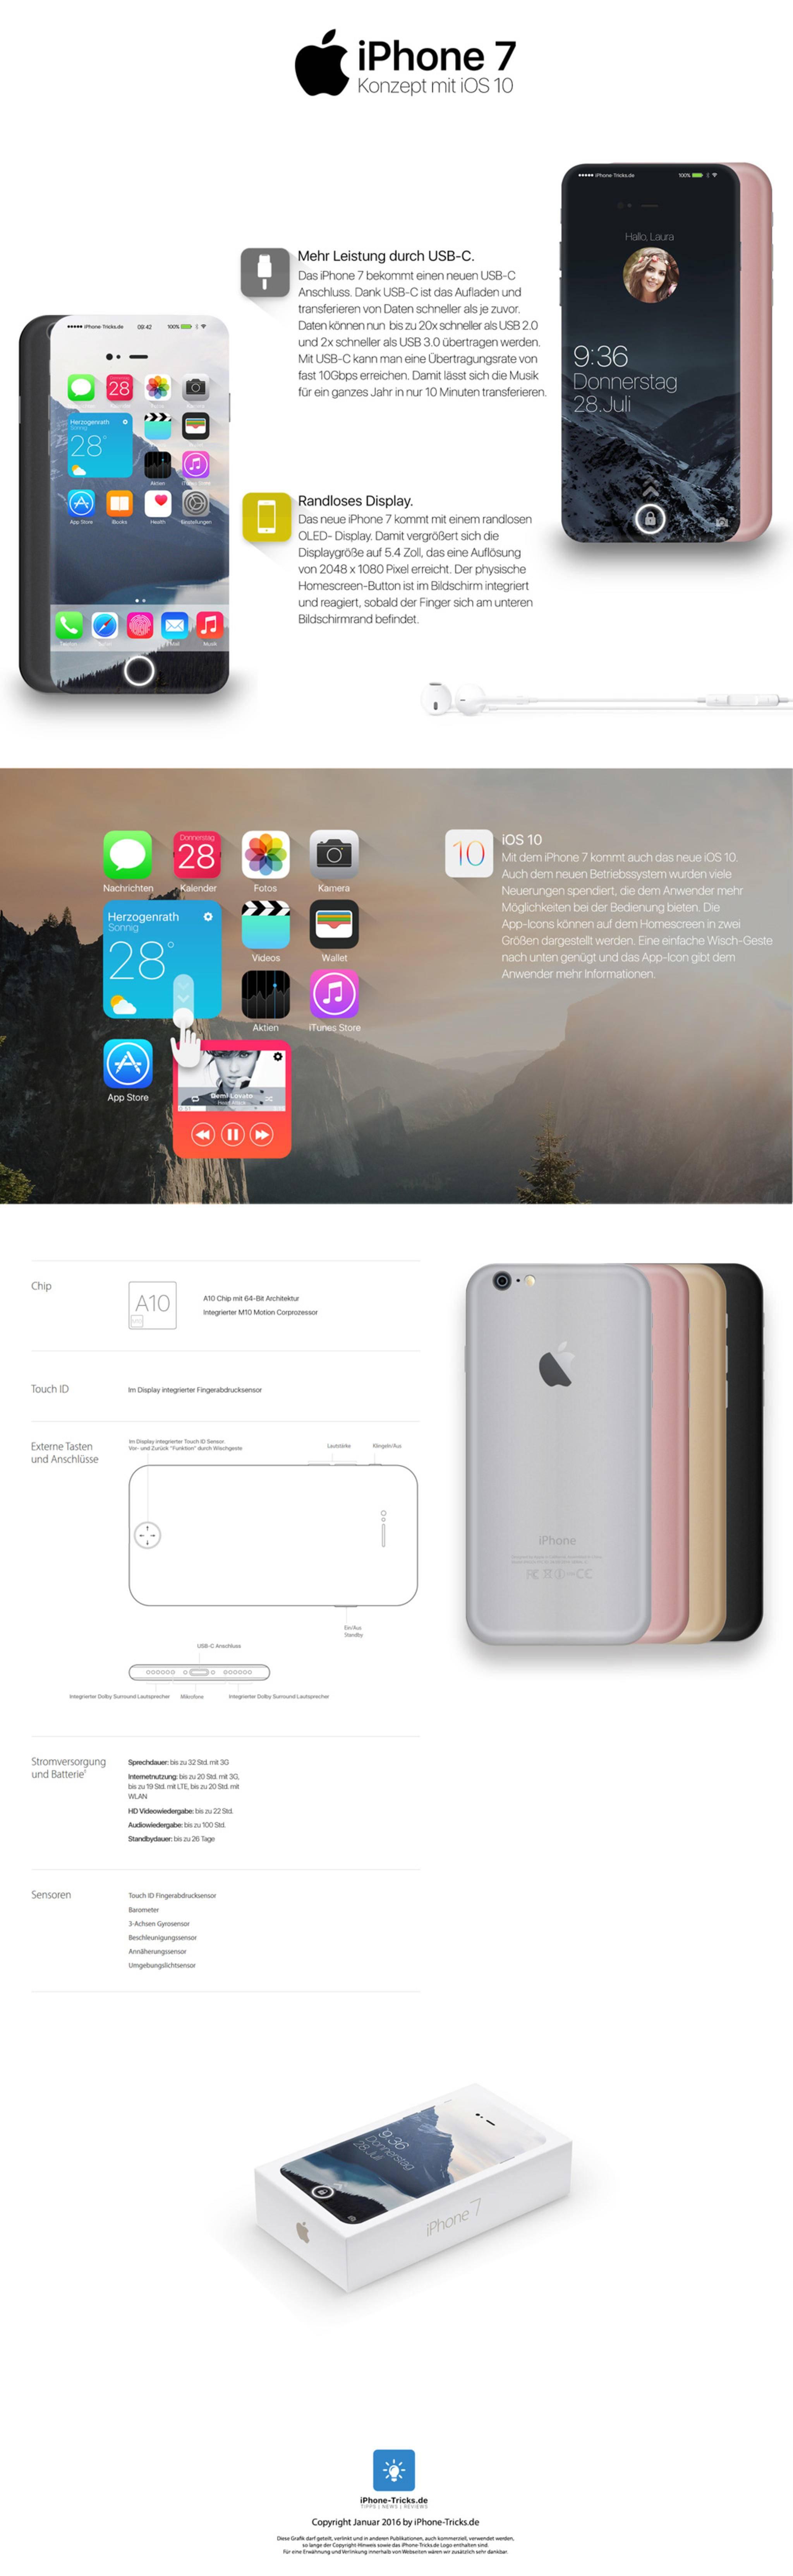 iphone-7-konzept-groß